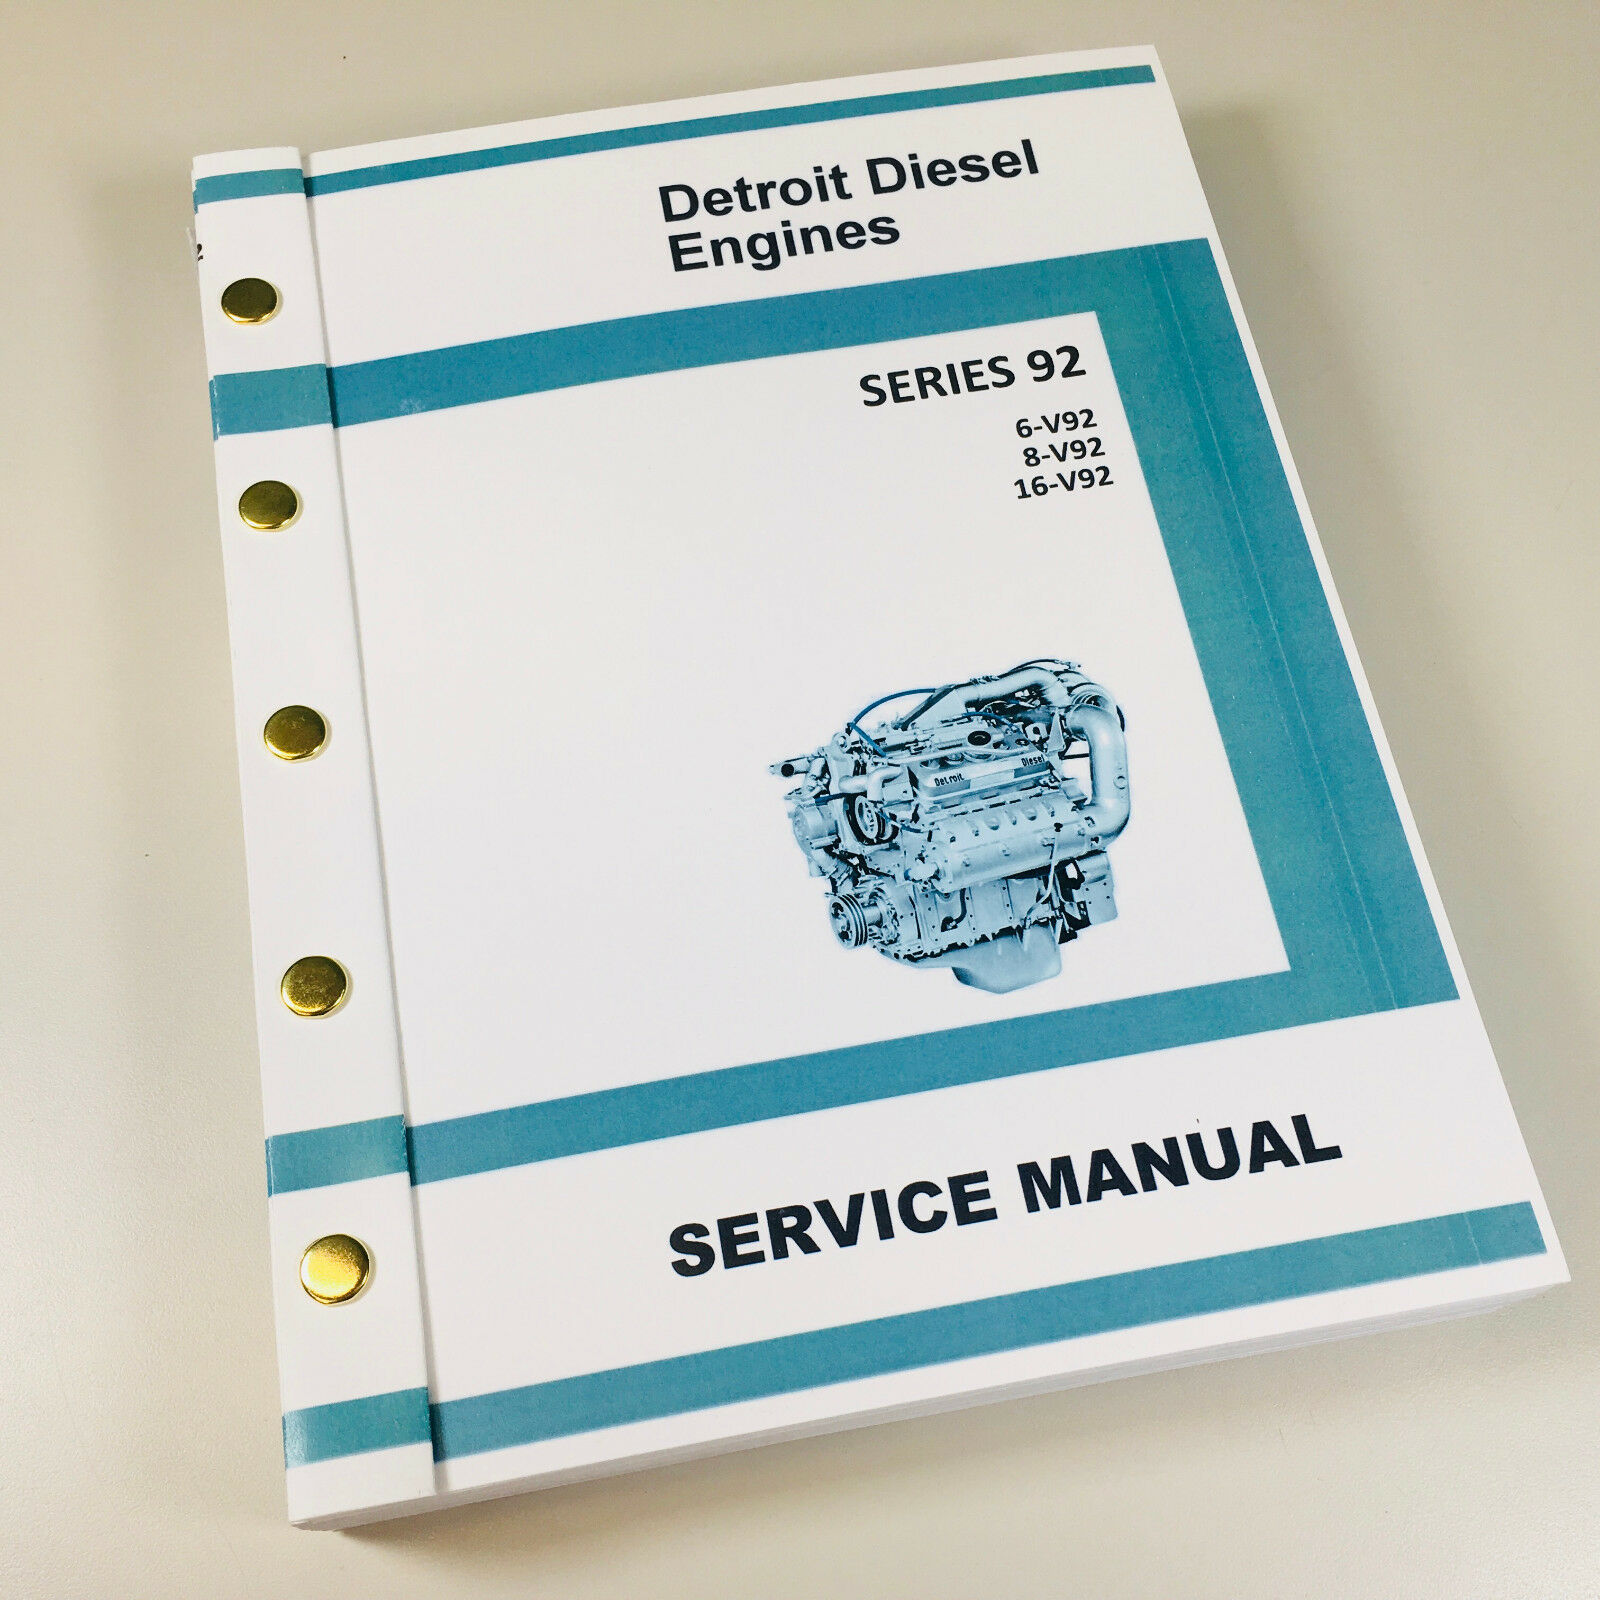 Fully Covers Detroit Diesel Engine Models: 92 V92 6V92 8V92 16V92. Complete  Service/Overhaul/Repair Manual